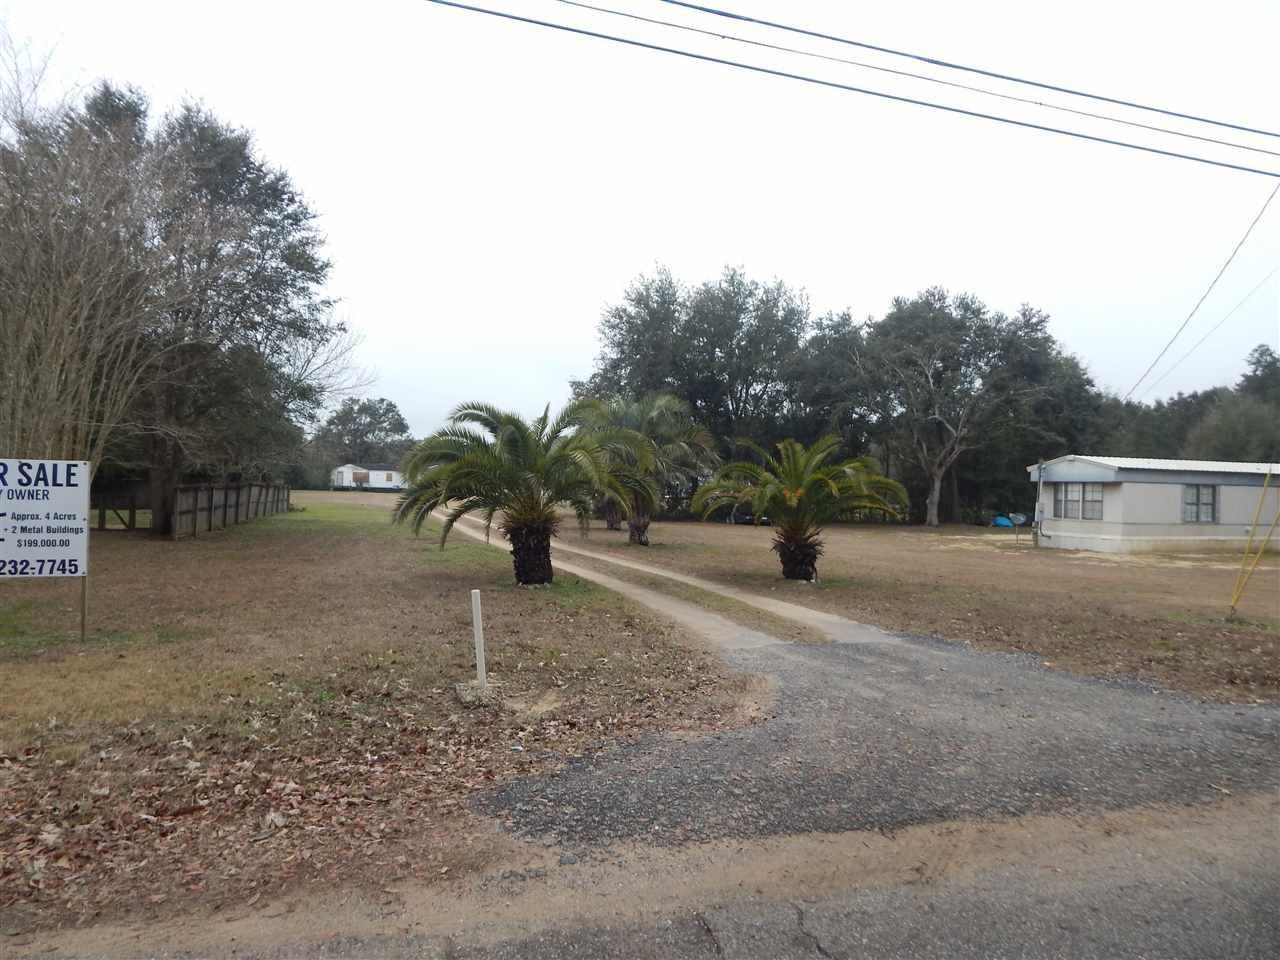 10127 Holsberry Rd, Pensacola, FL 32534